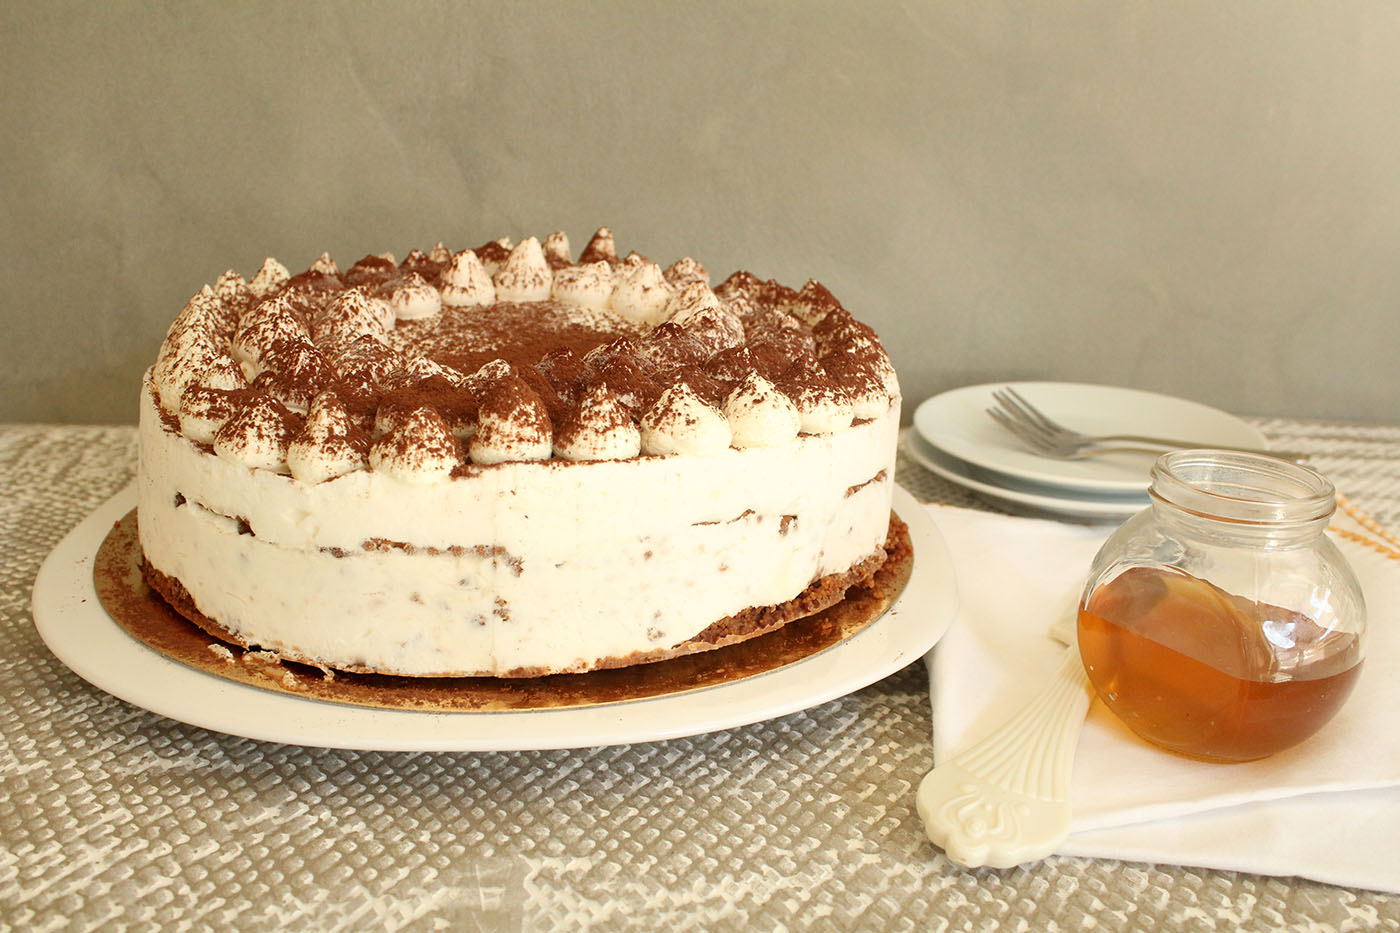 IMG 9734 - עוגת טרימיסו דבש ופקאן